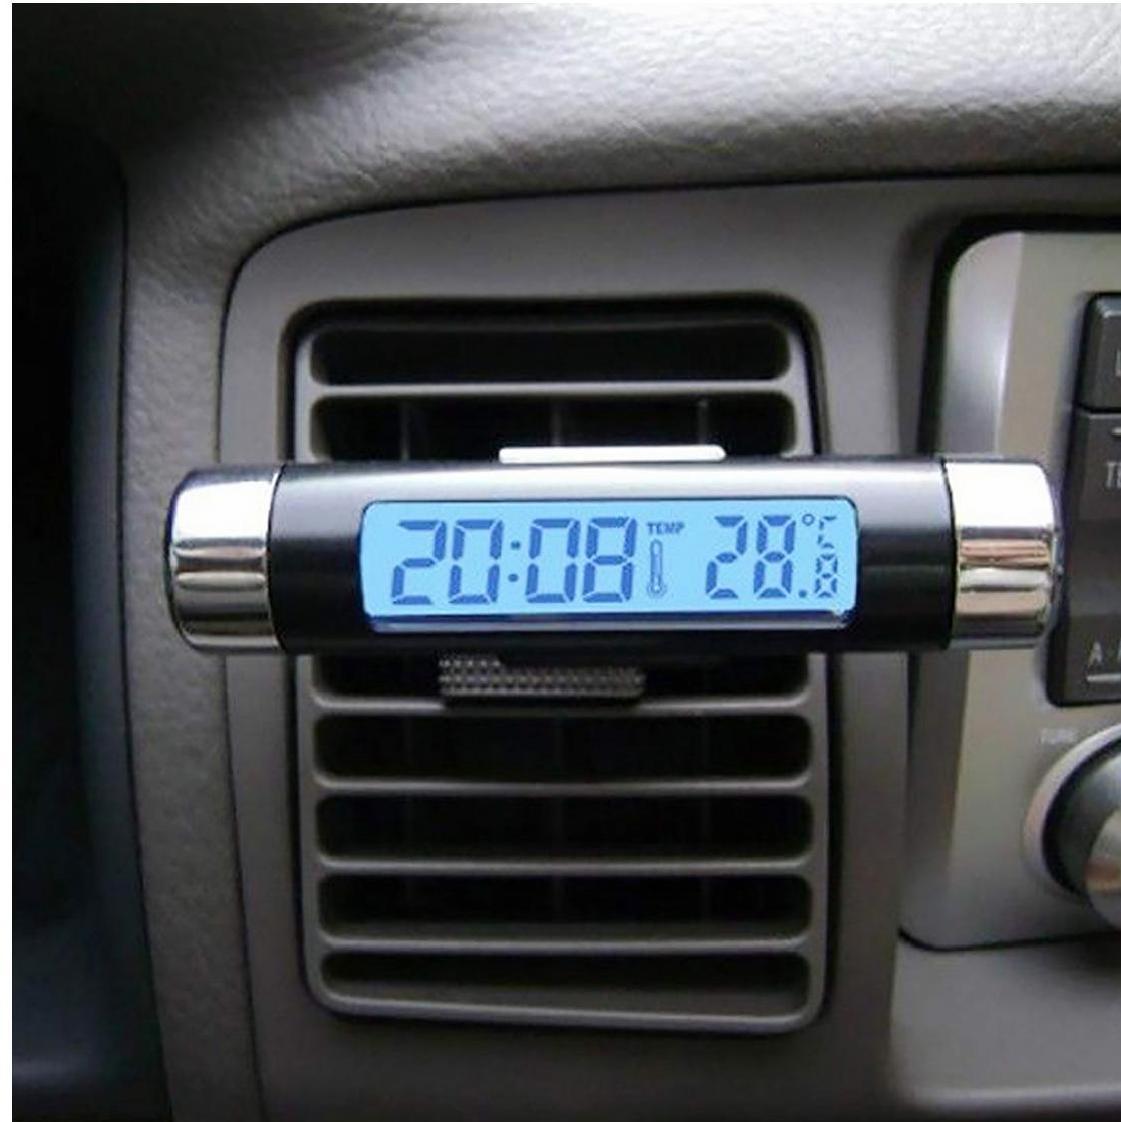 Digital Car Auto Clock Car Thermometer Auto Accessory Car Accessory Clock And Thermometer For Car